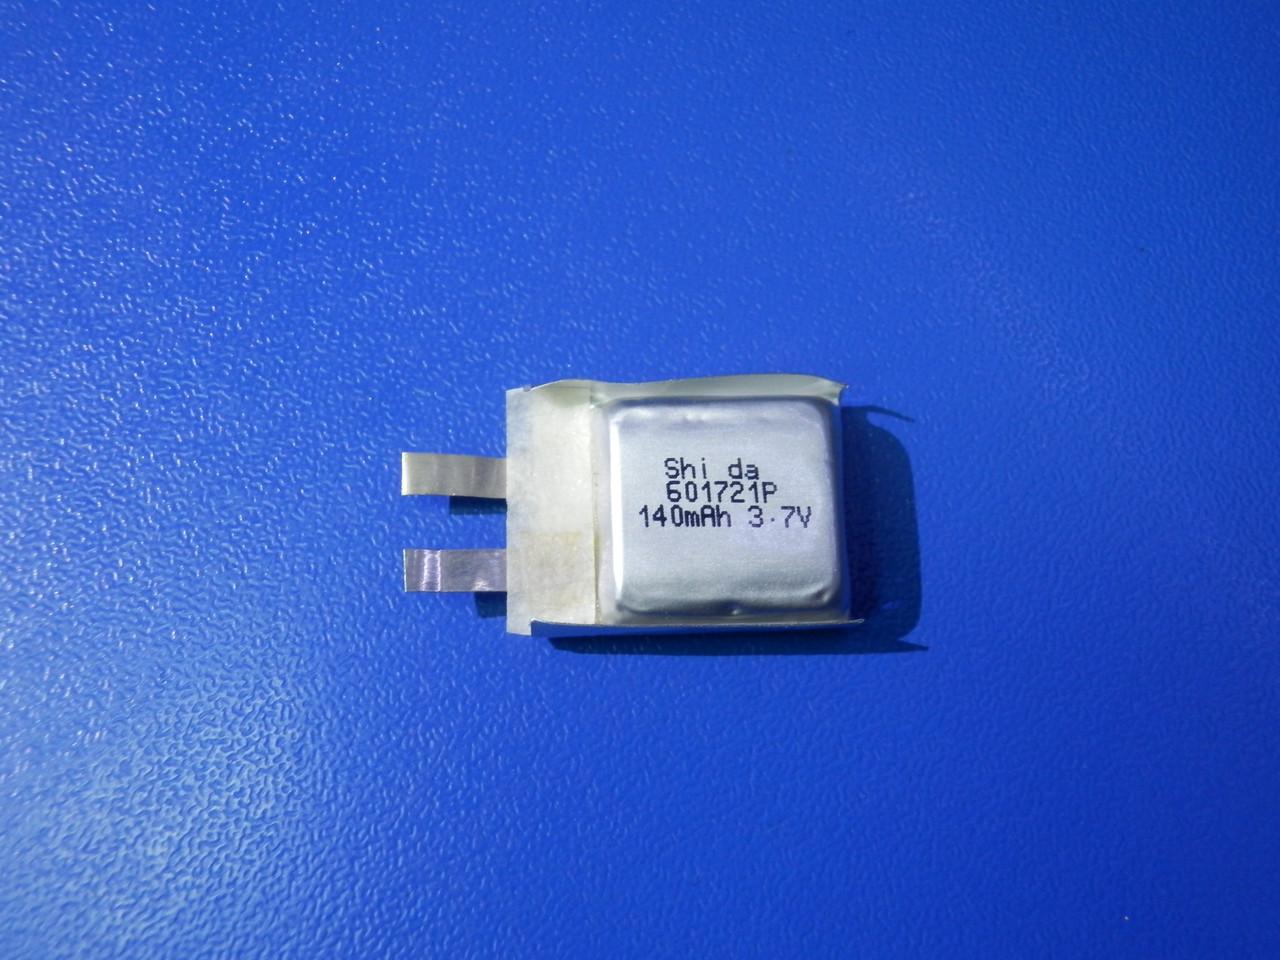 Акумулятор Li-pol Shida 601721P 3,7 v 140mAh